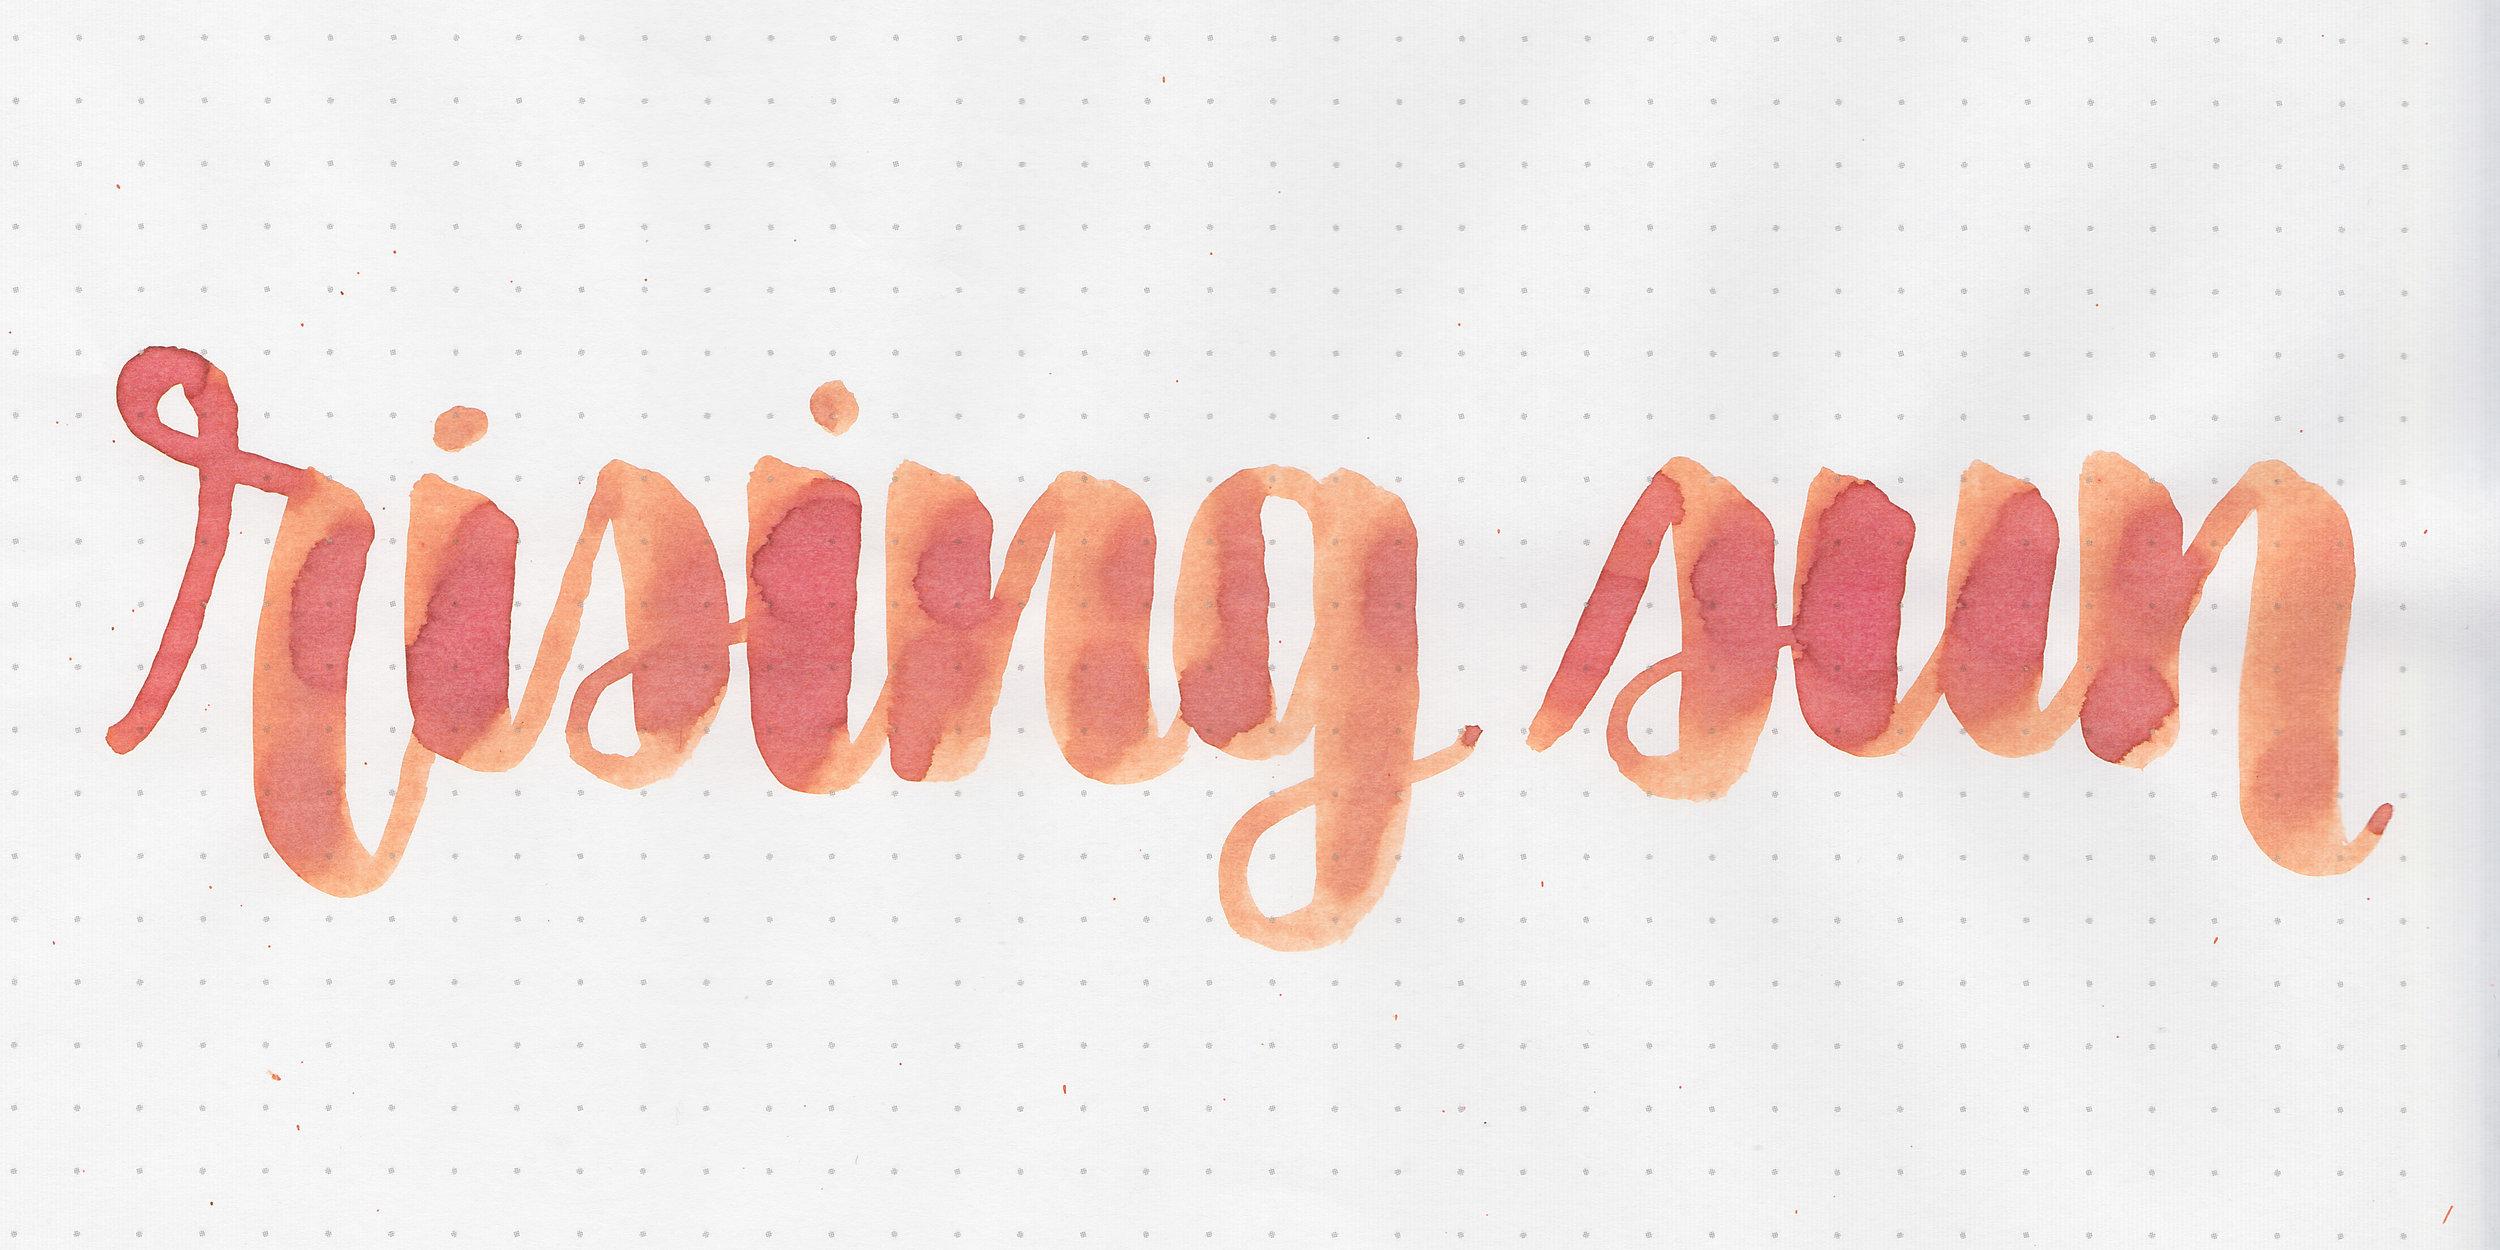 pp-rising-sun-2.jpg